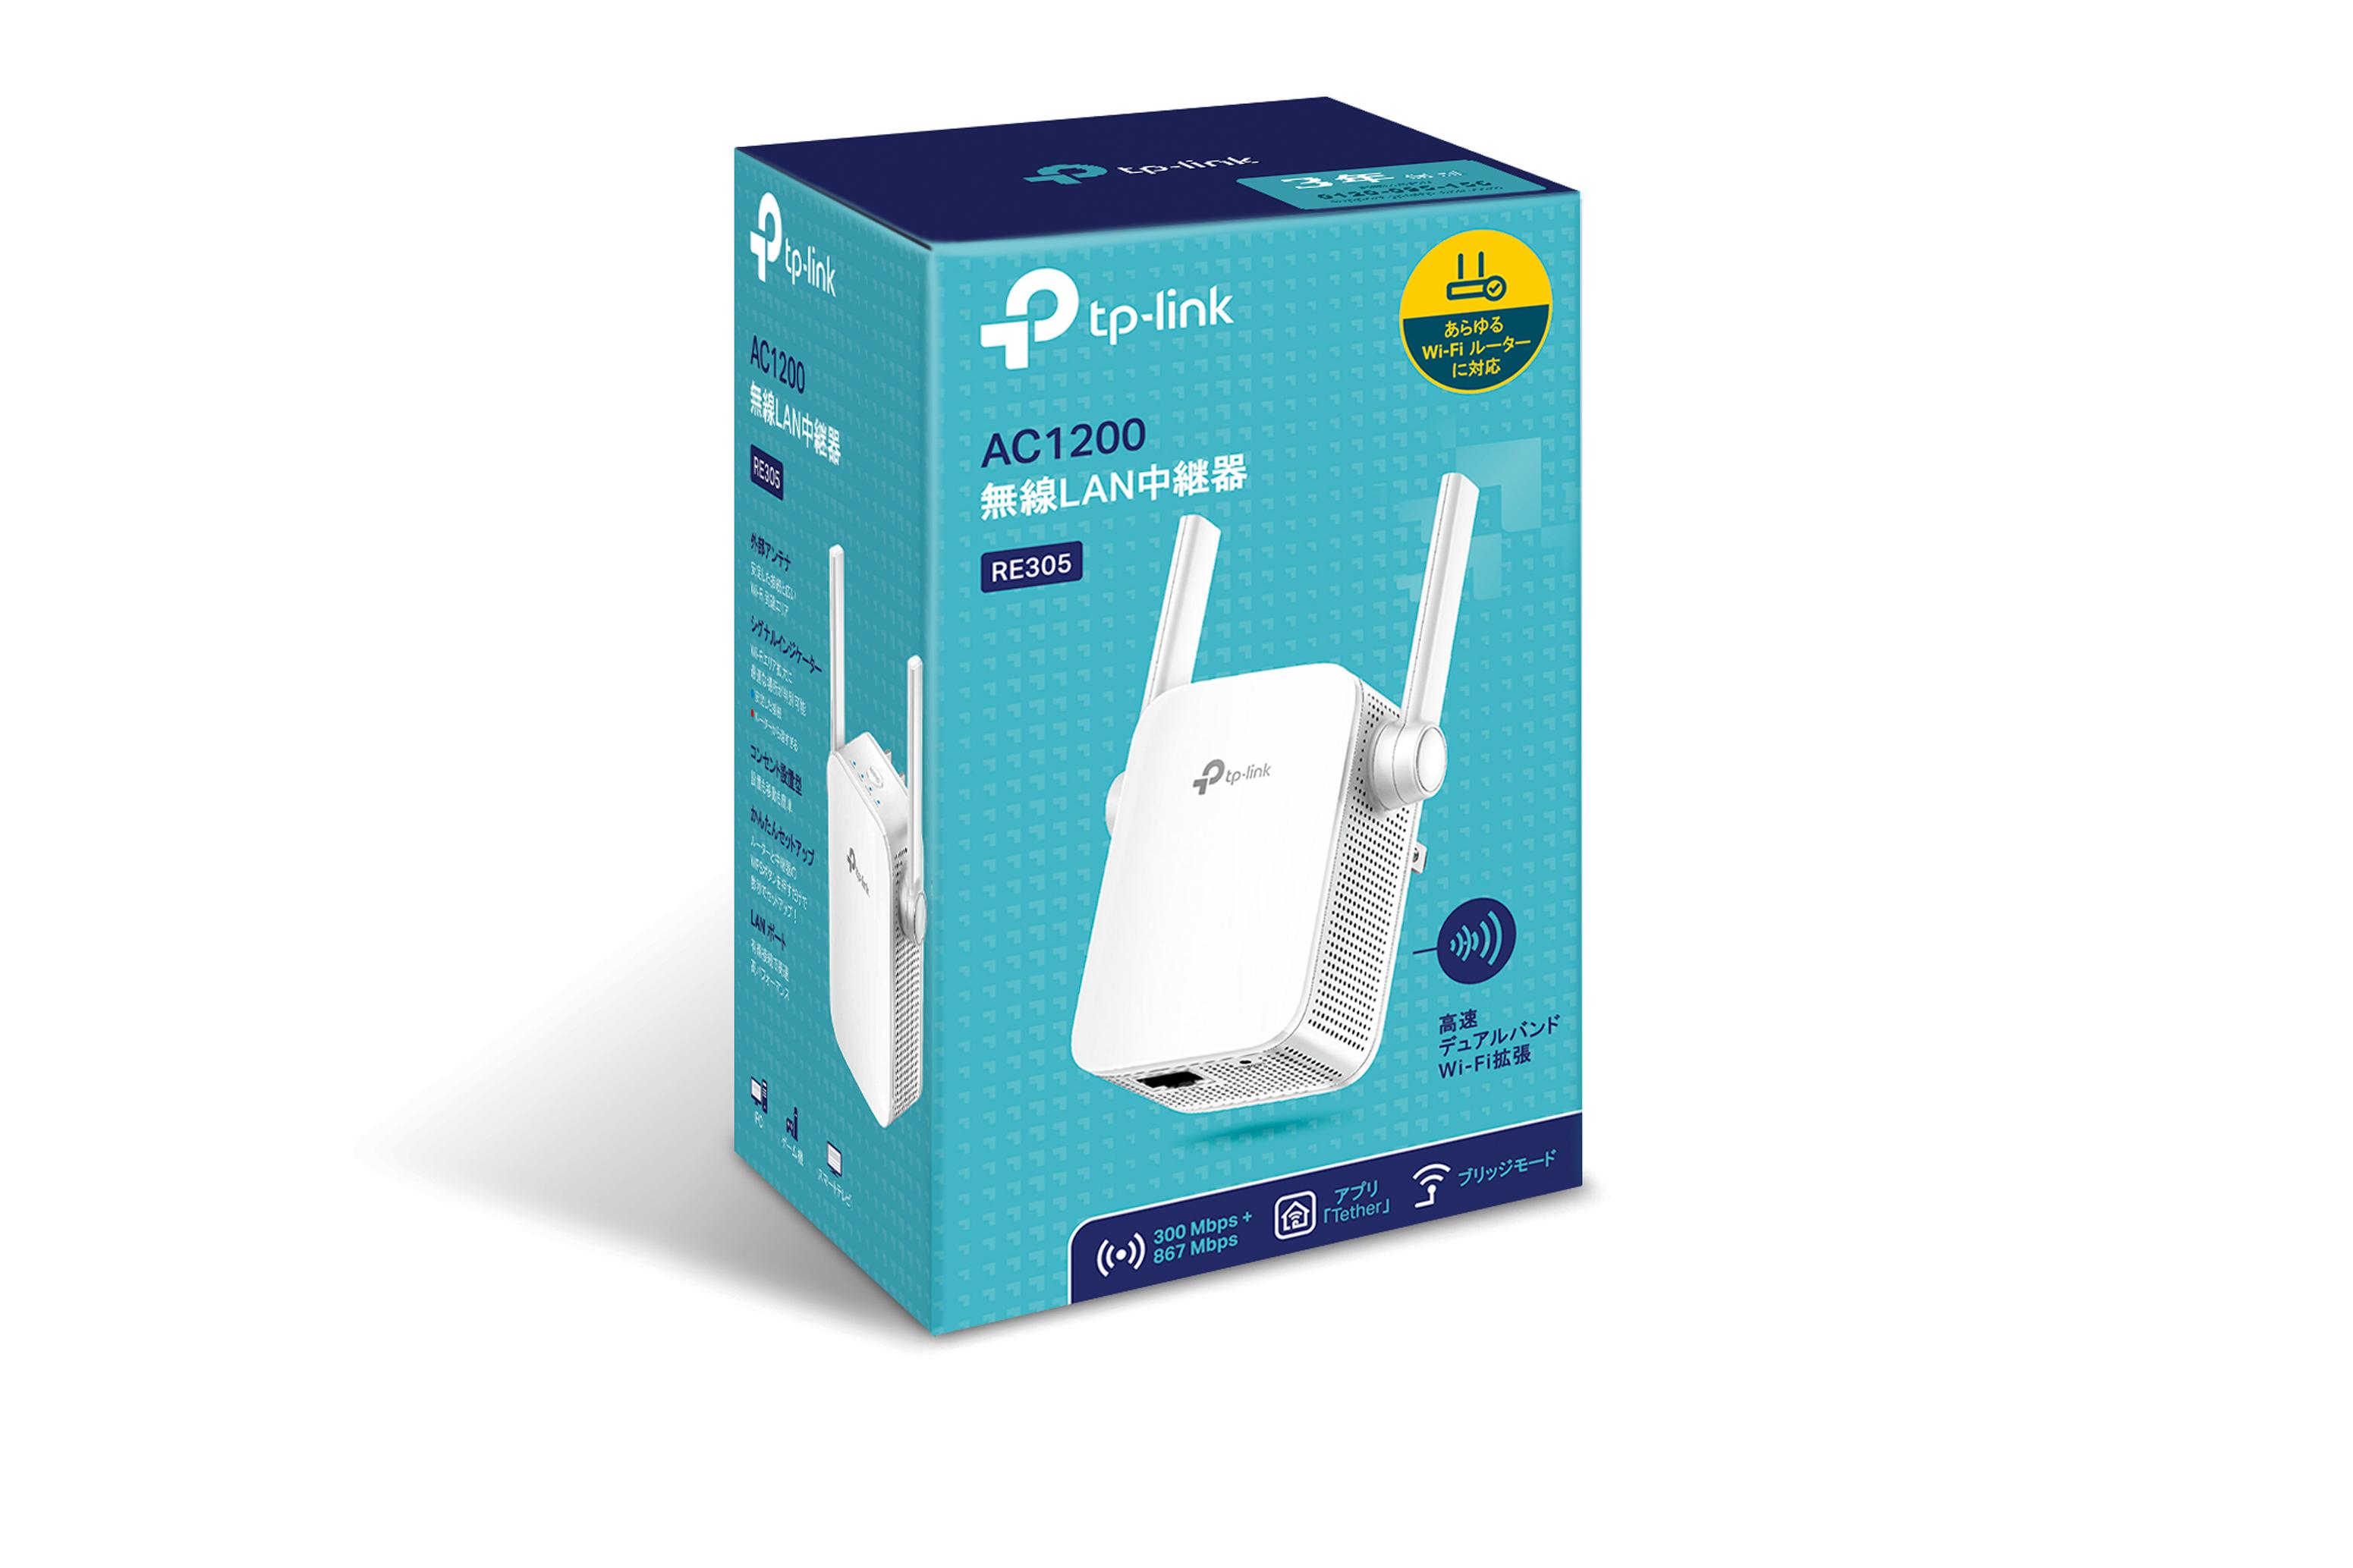 RE305 | AC1200 無線LAN中継器 | TP-Link Japan